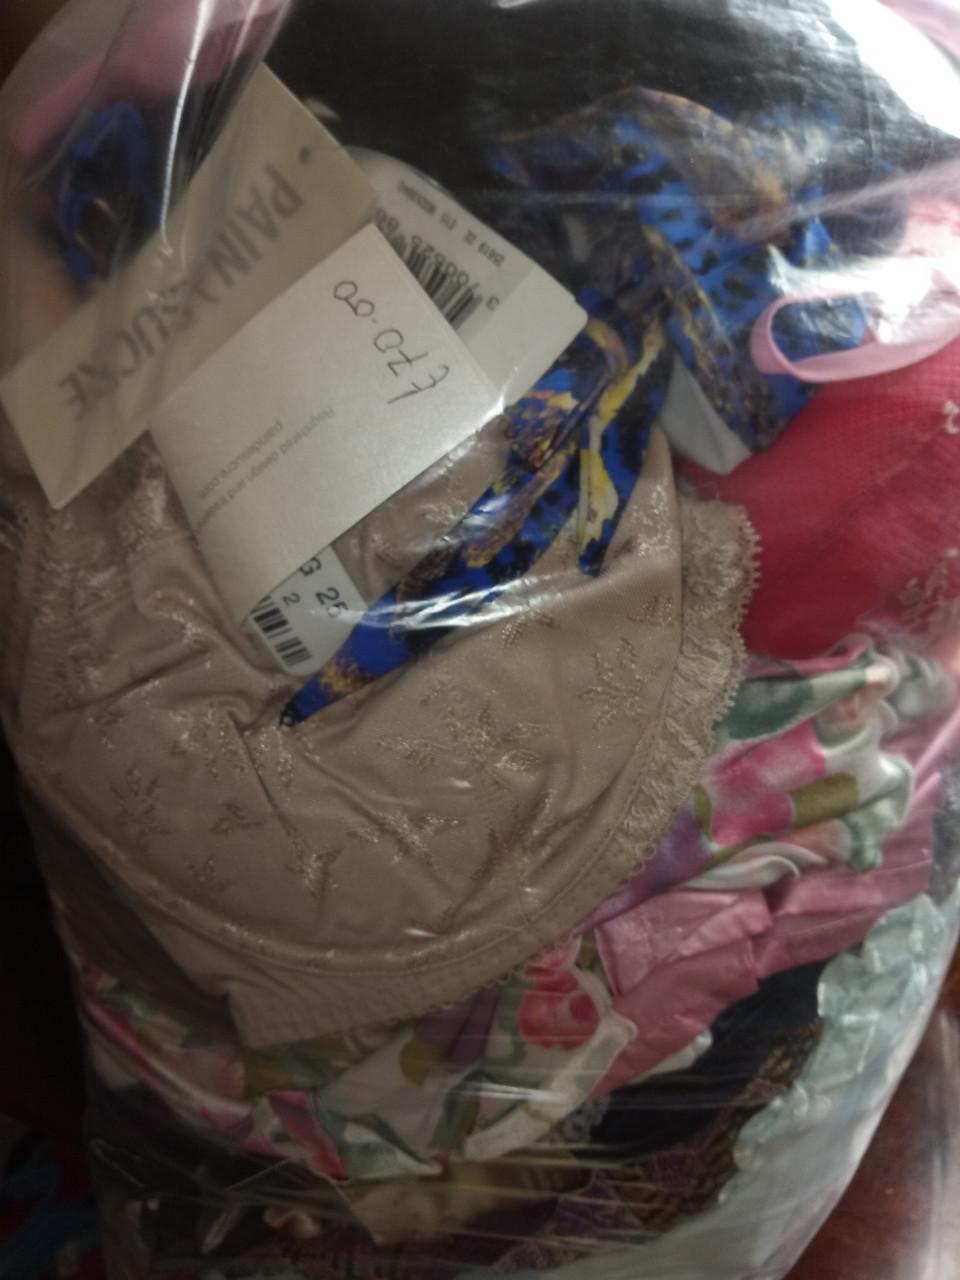 Нижнее белье женское секонд хенд крем, цена 529,83 грн./кг ... - photo#34